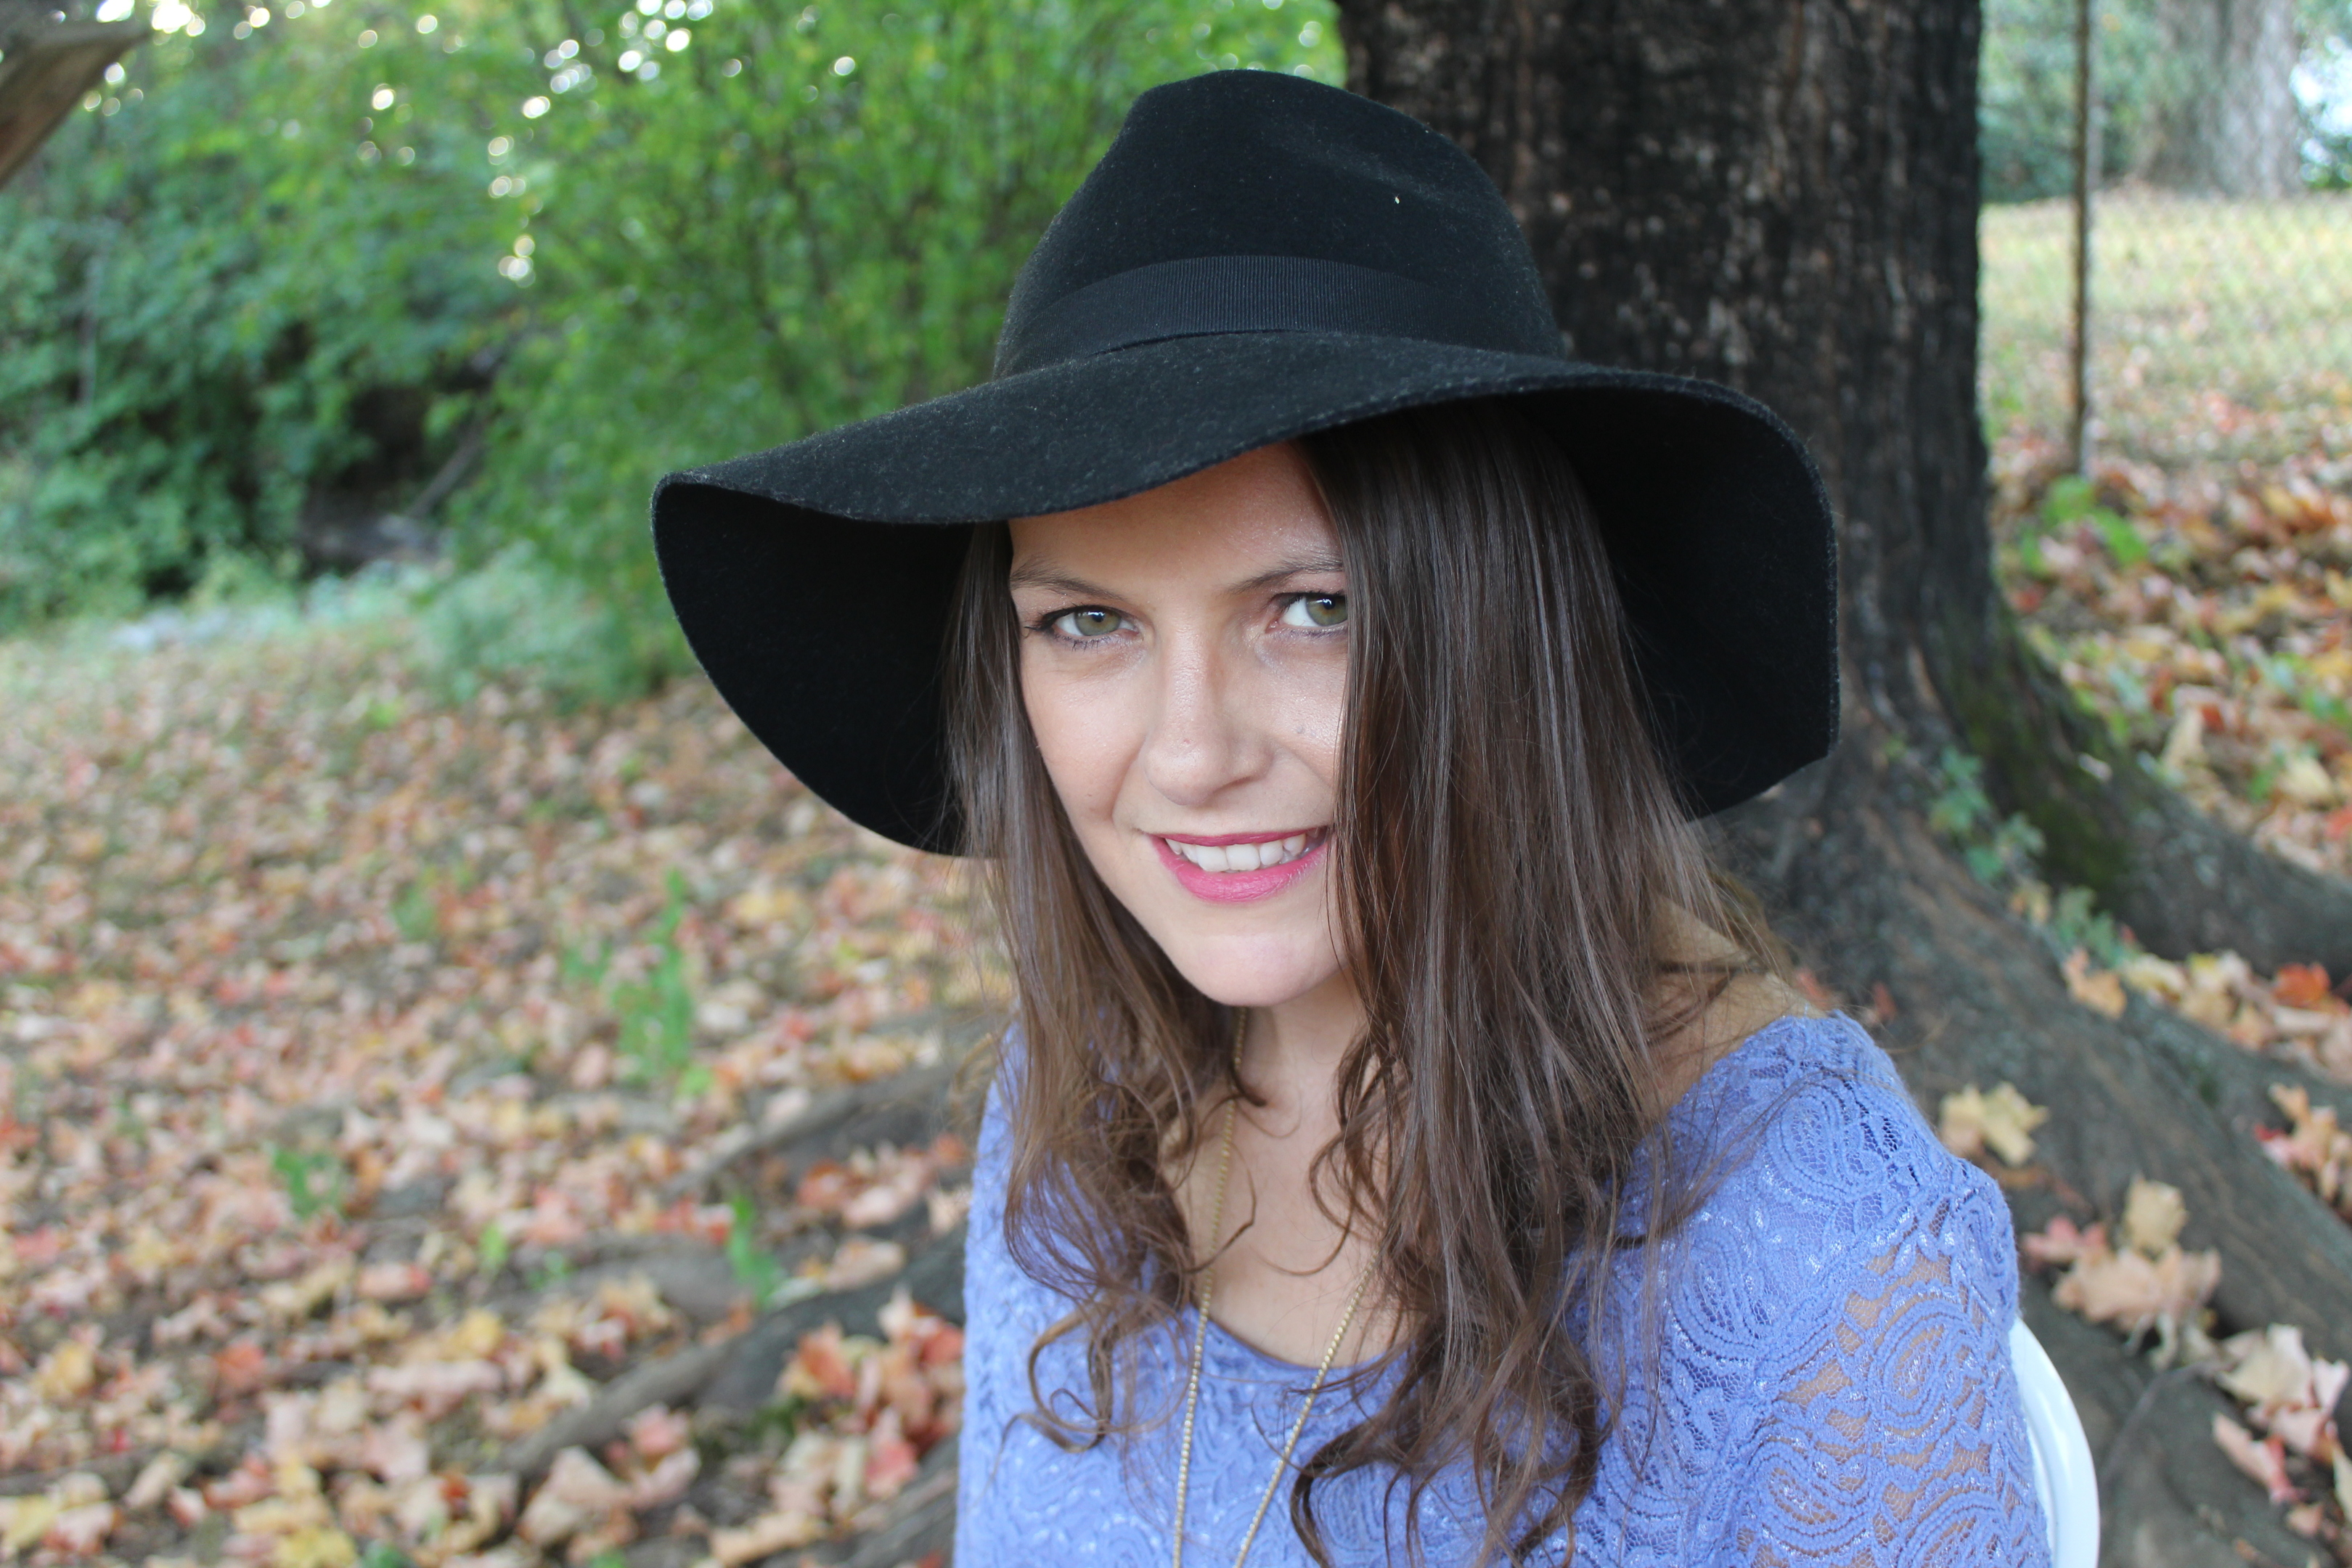 Nashville star Laura McGhee was inspired by her Angus homeland.